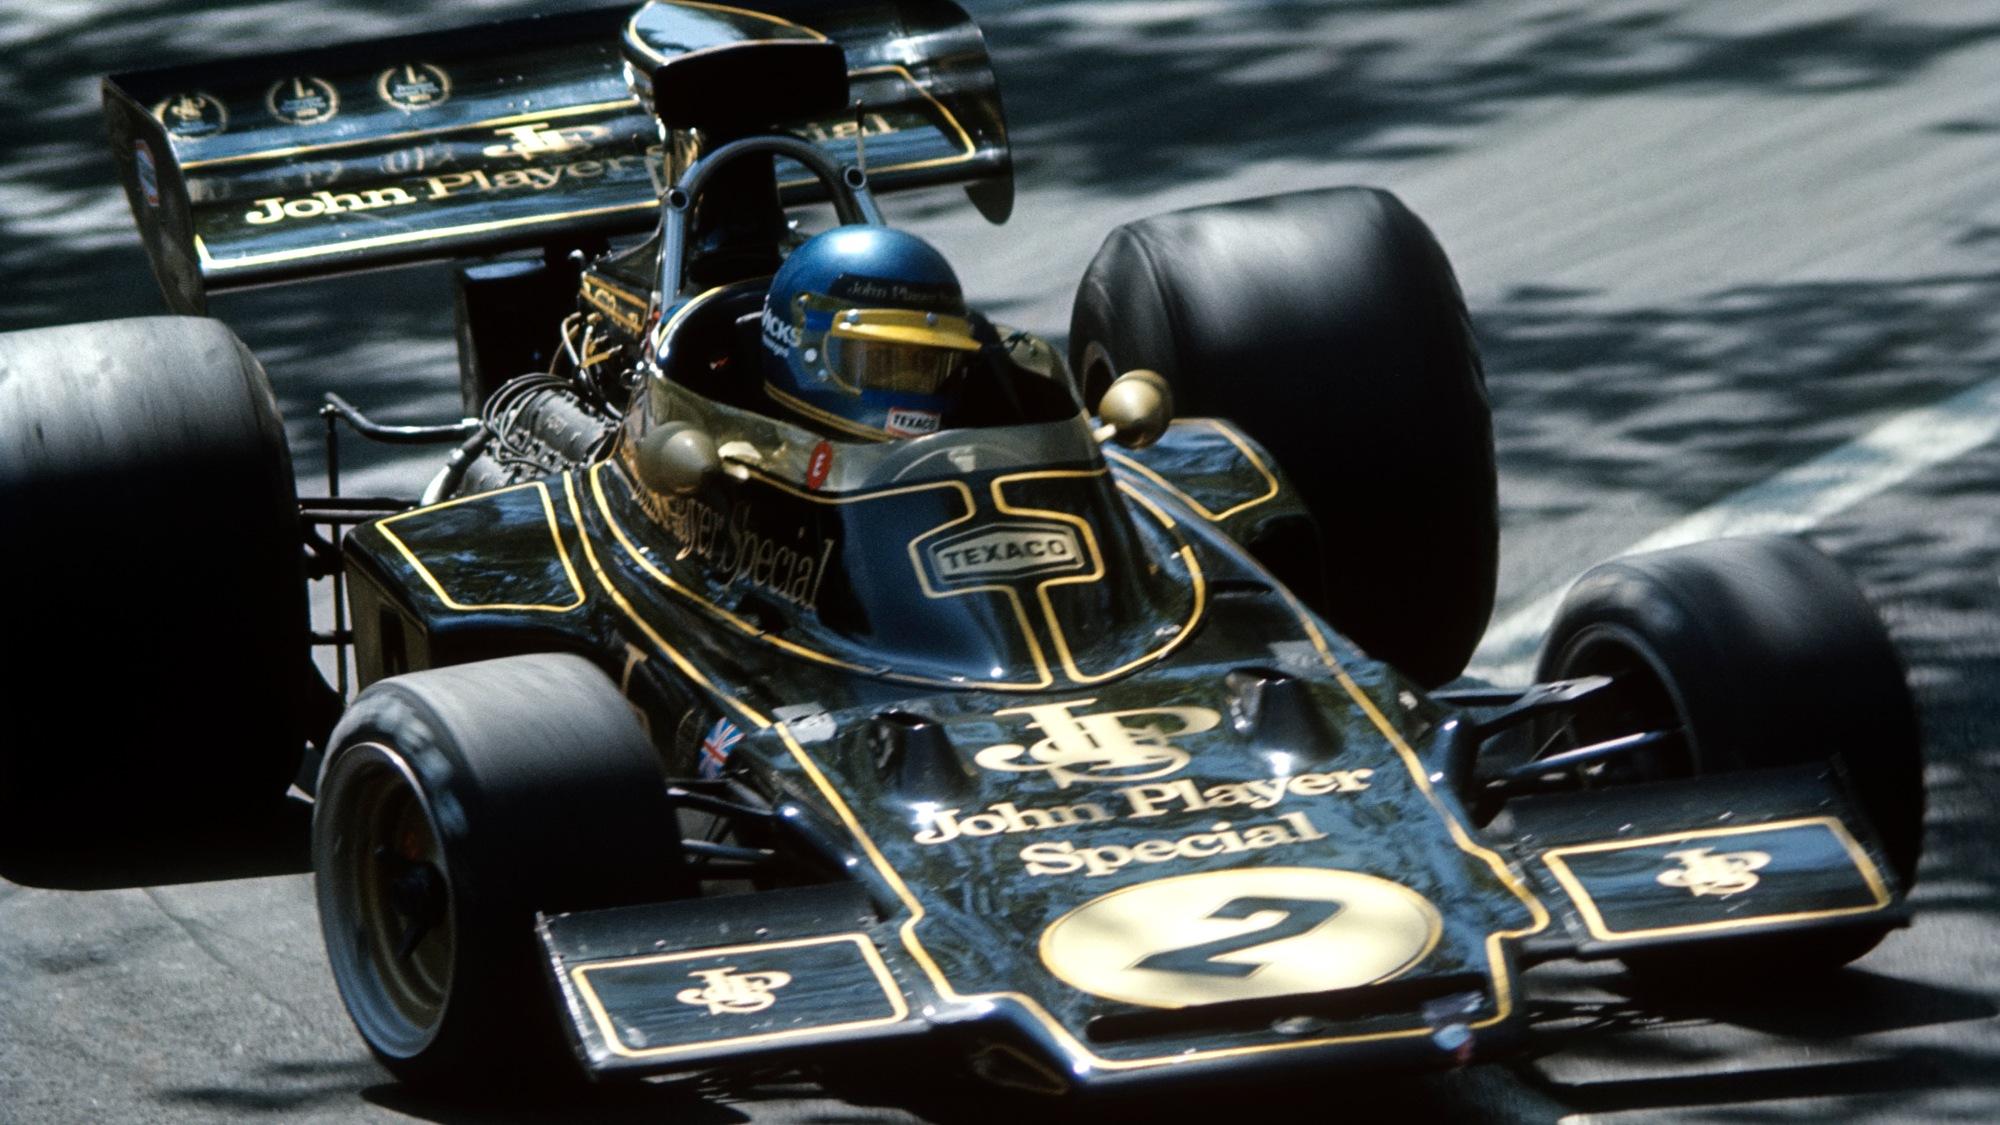 Ronnie Peterson, 1973 Spanish gp